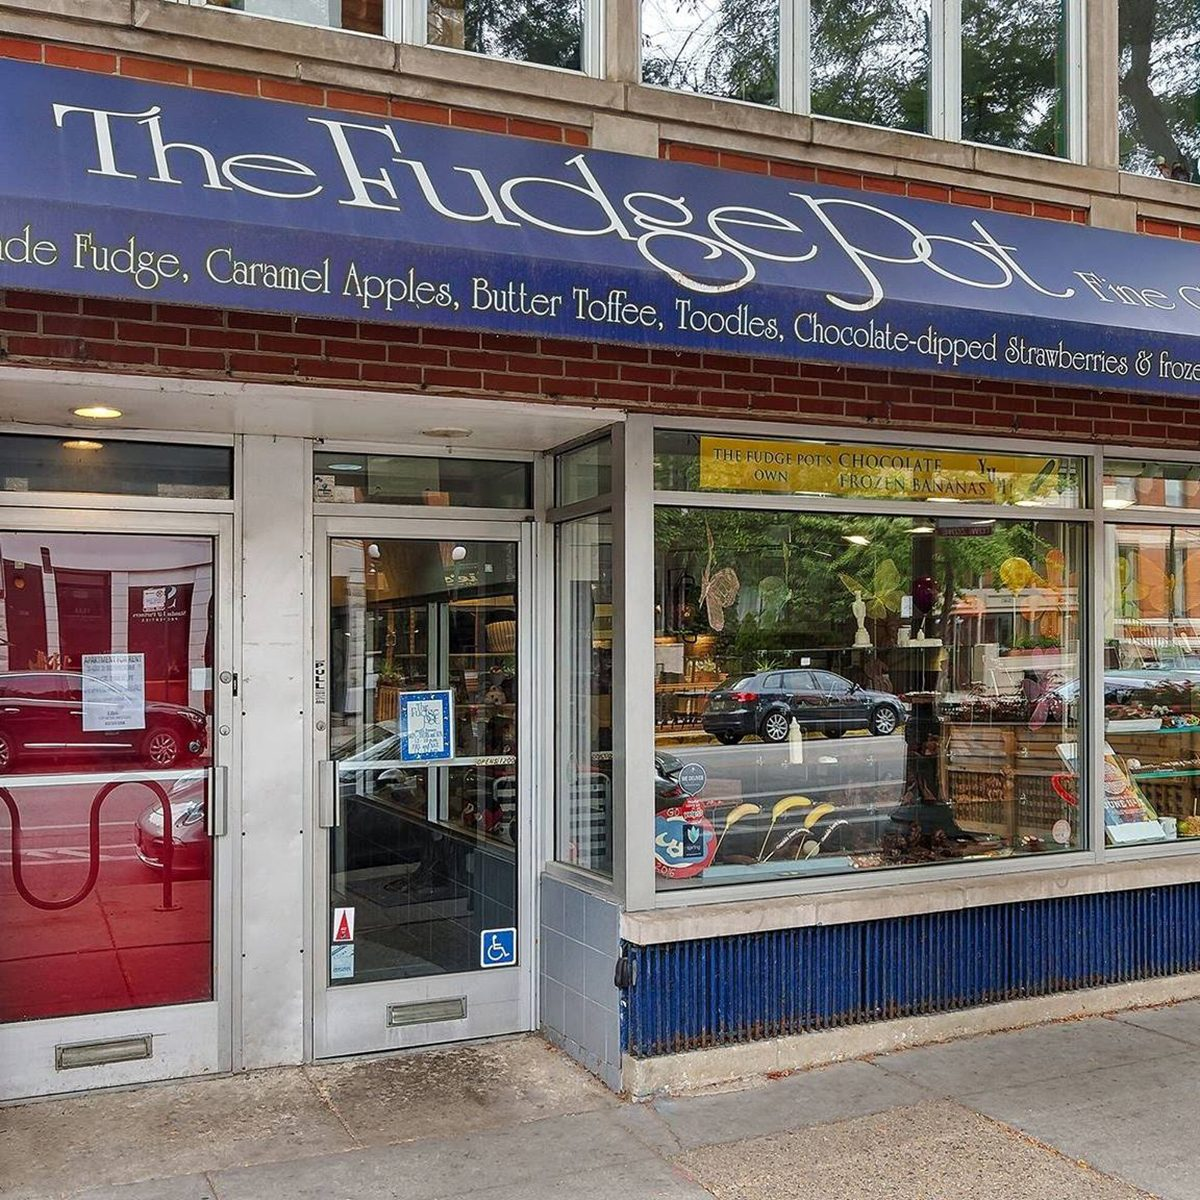 The Best Fudge Shop in Illinois - The Fudge Pot